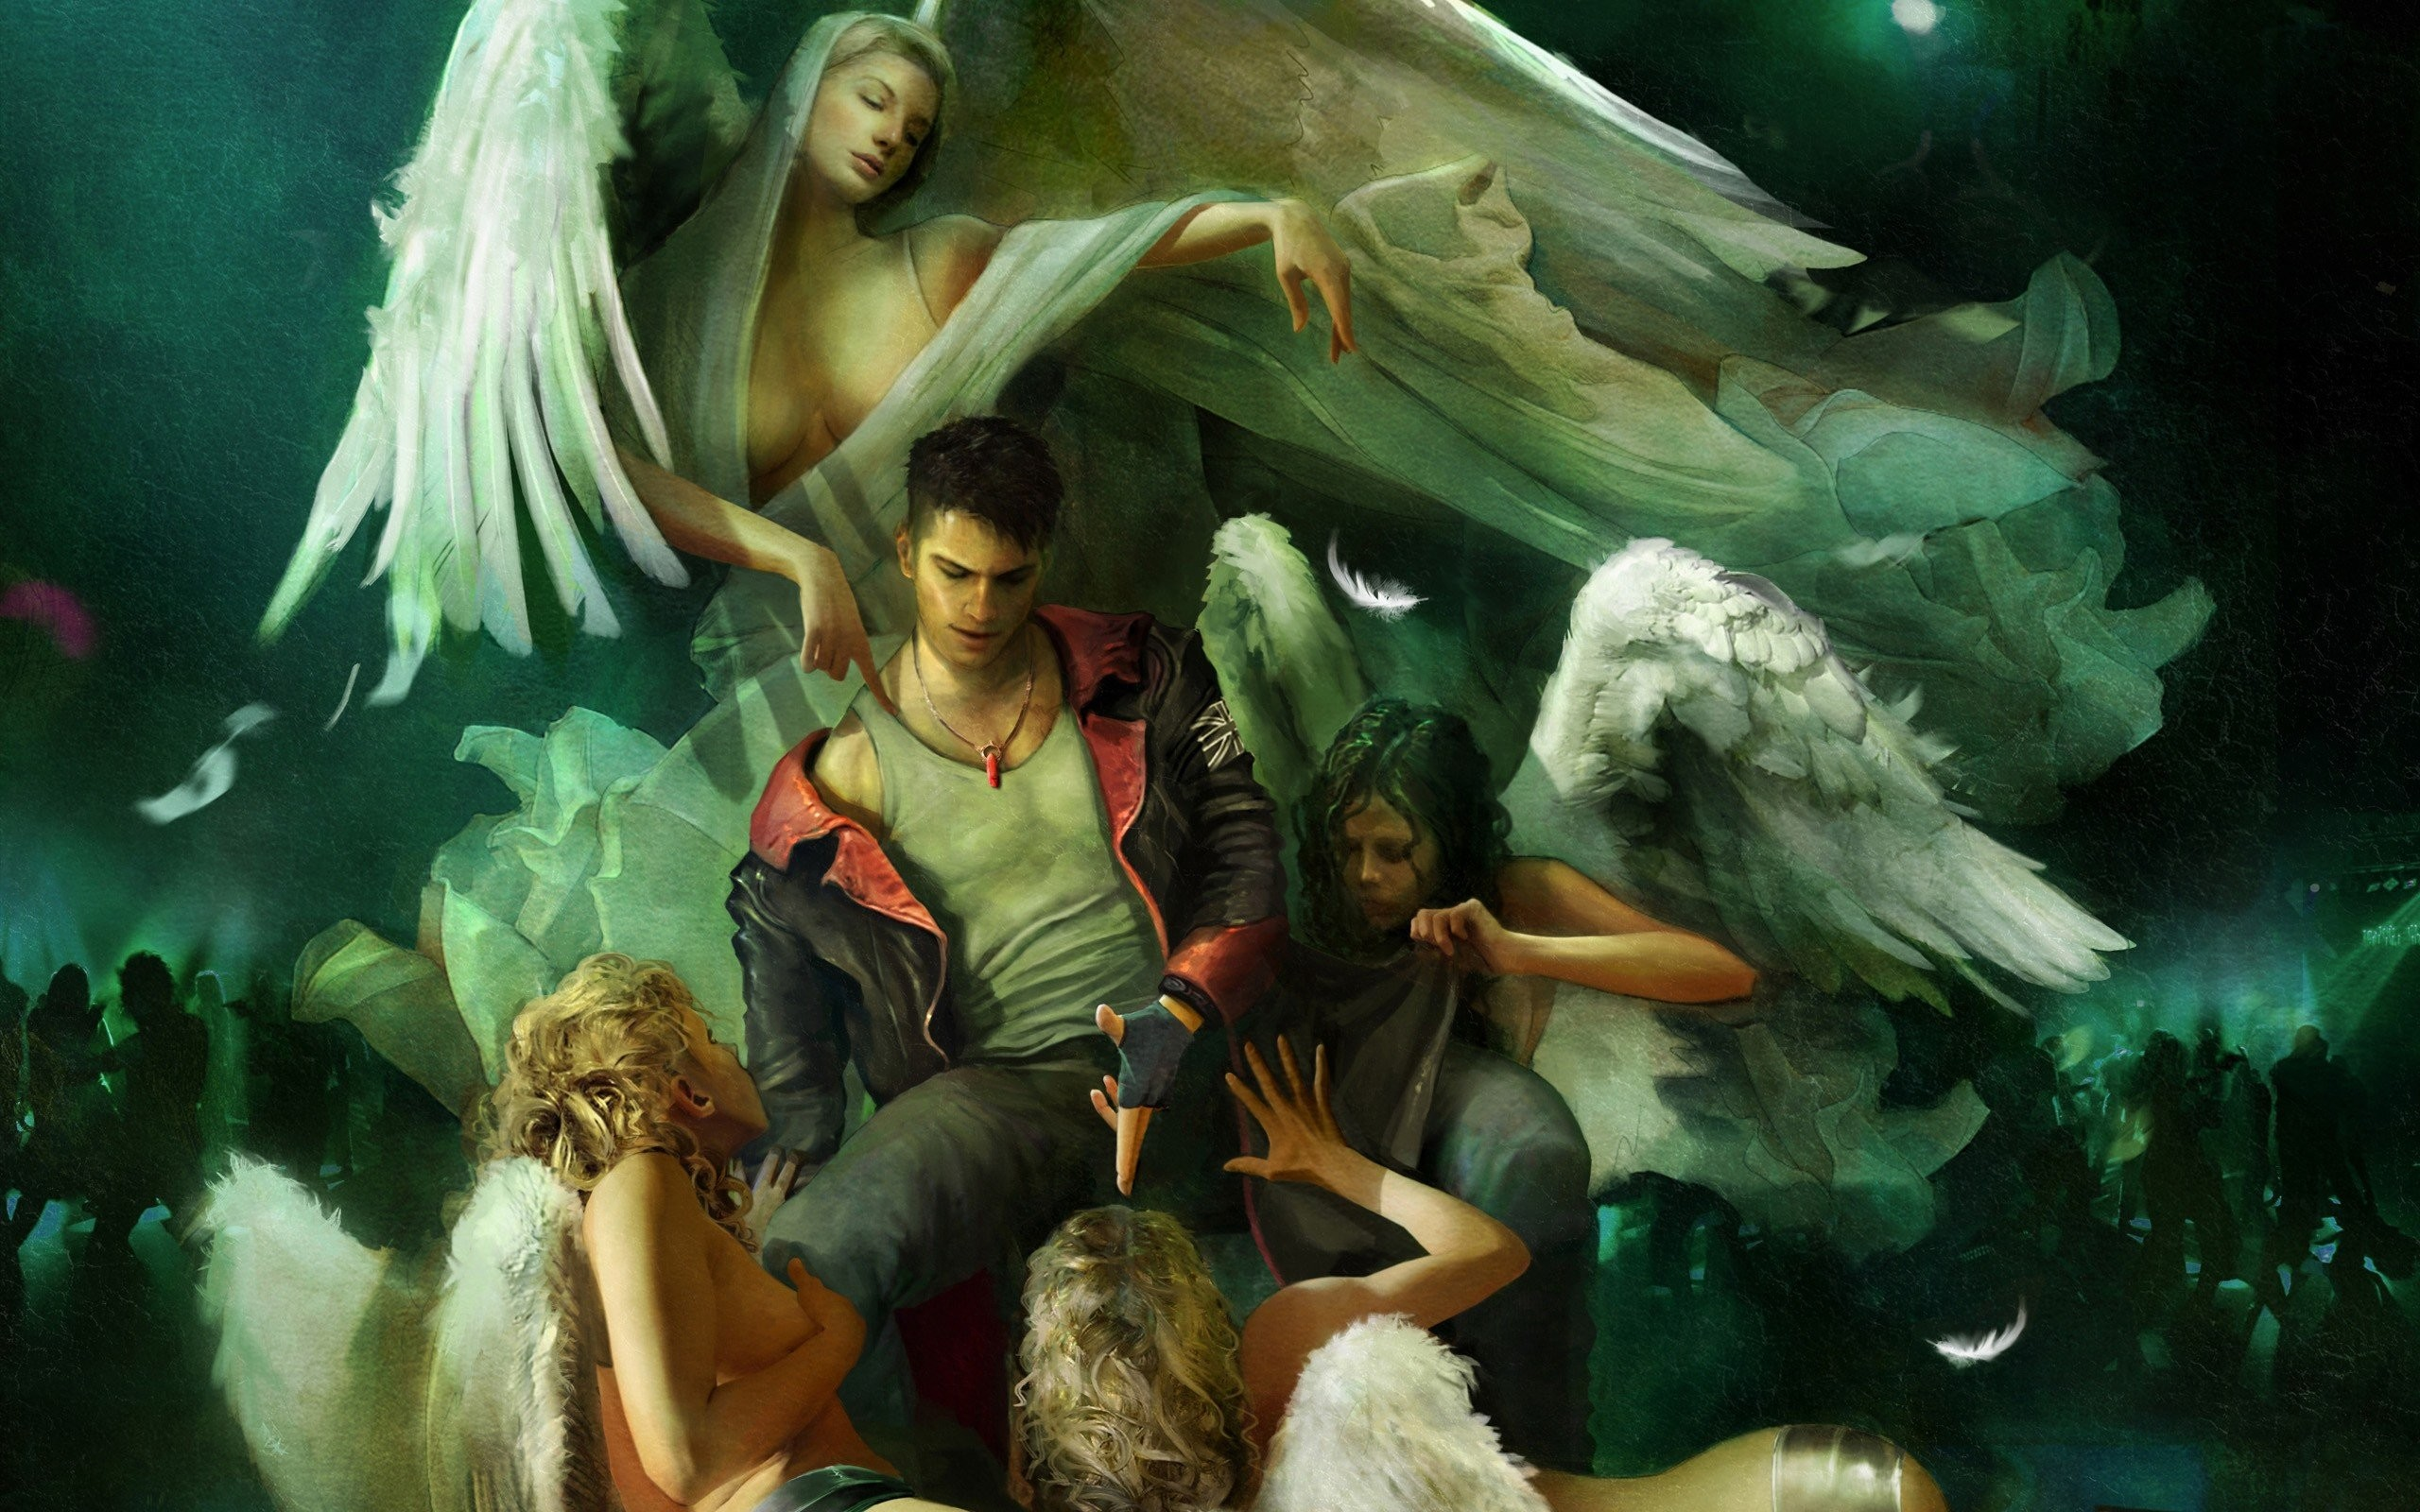 Angels Devil May Cry Vergil dmc wallpaper | | 254647 | WallpaperUP